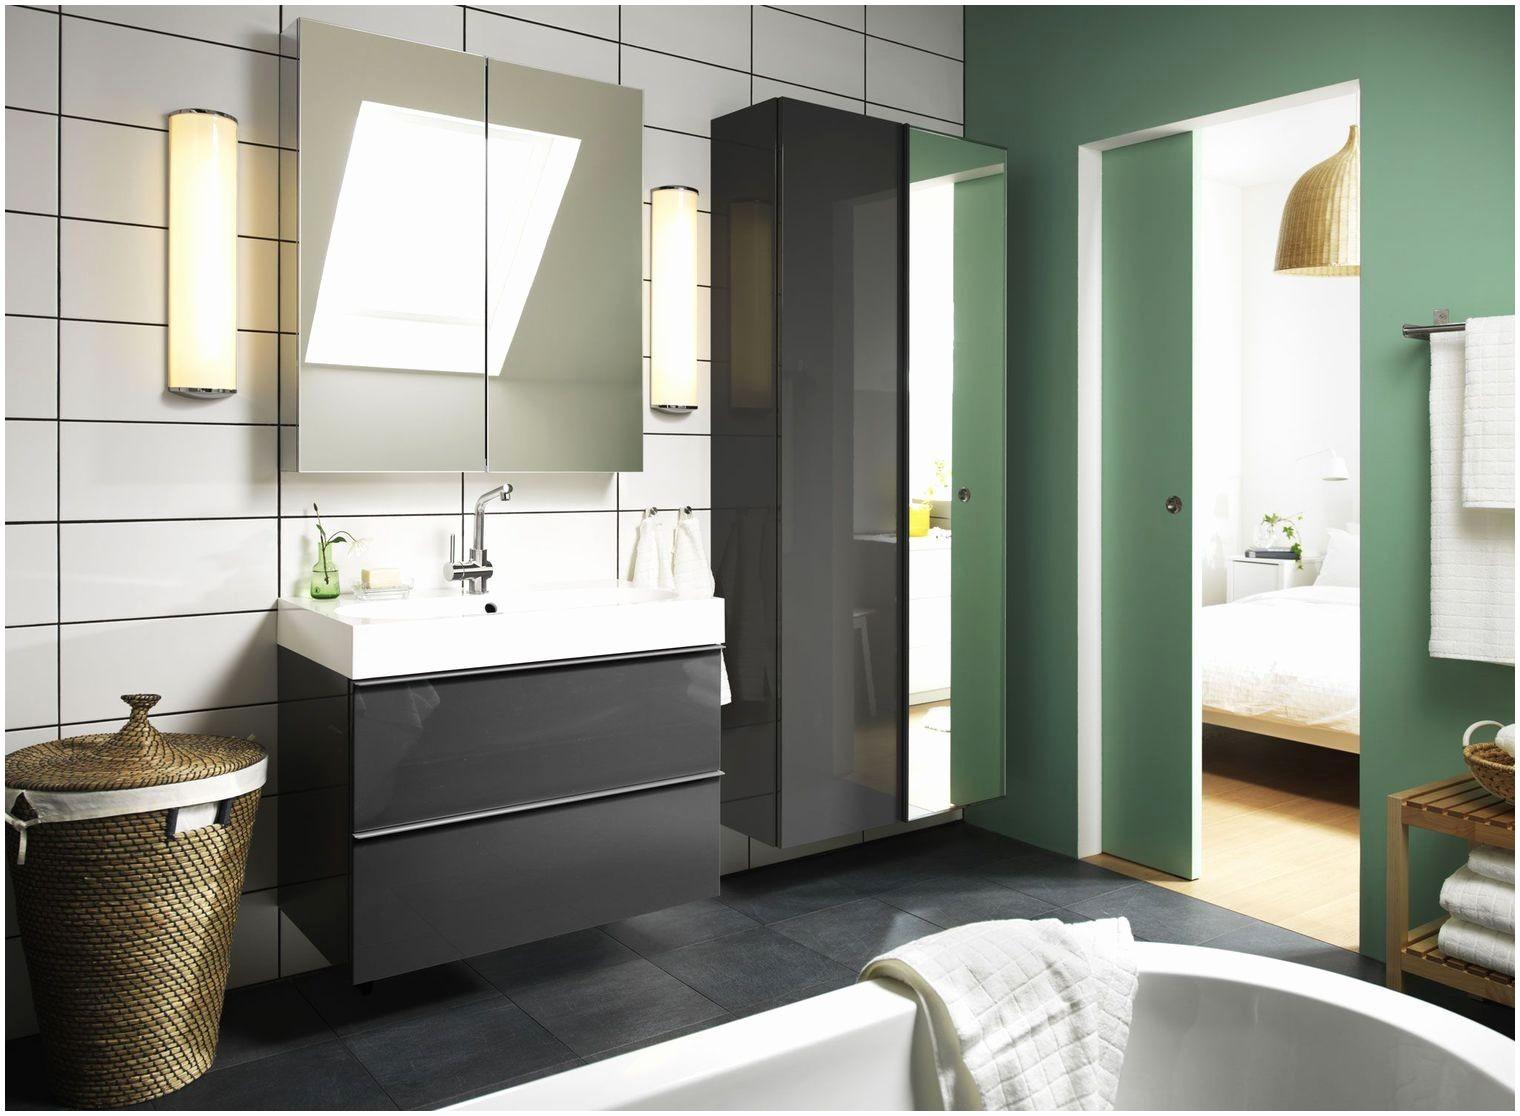 Meubles Salle De Bain Ikea Meilleur De Photographie 24luxe Meuble Salle Bain Ikea Intérieur De La Maison